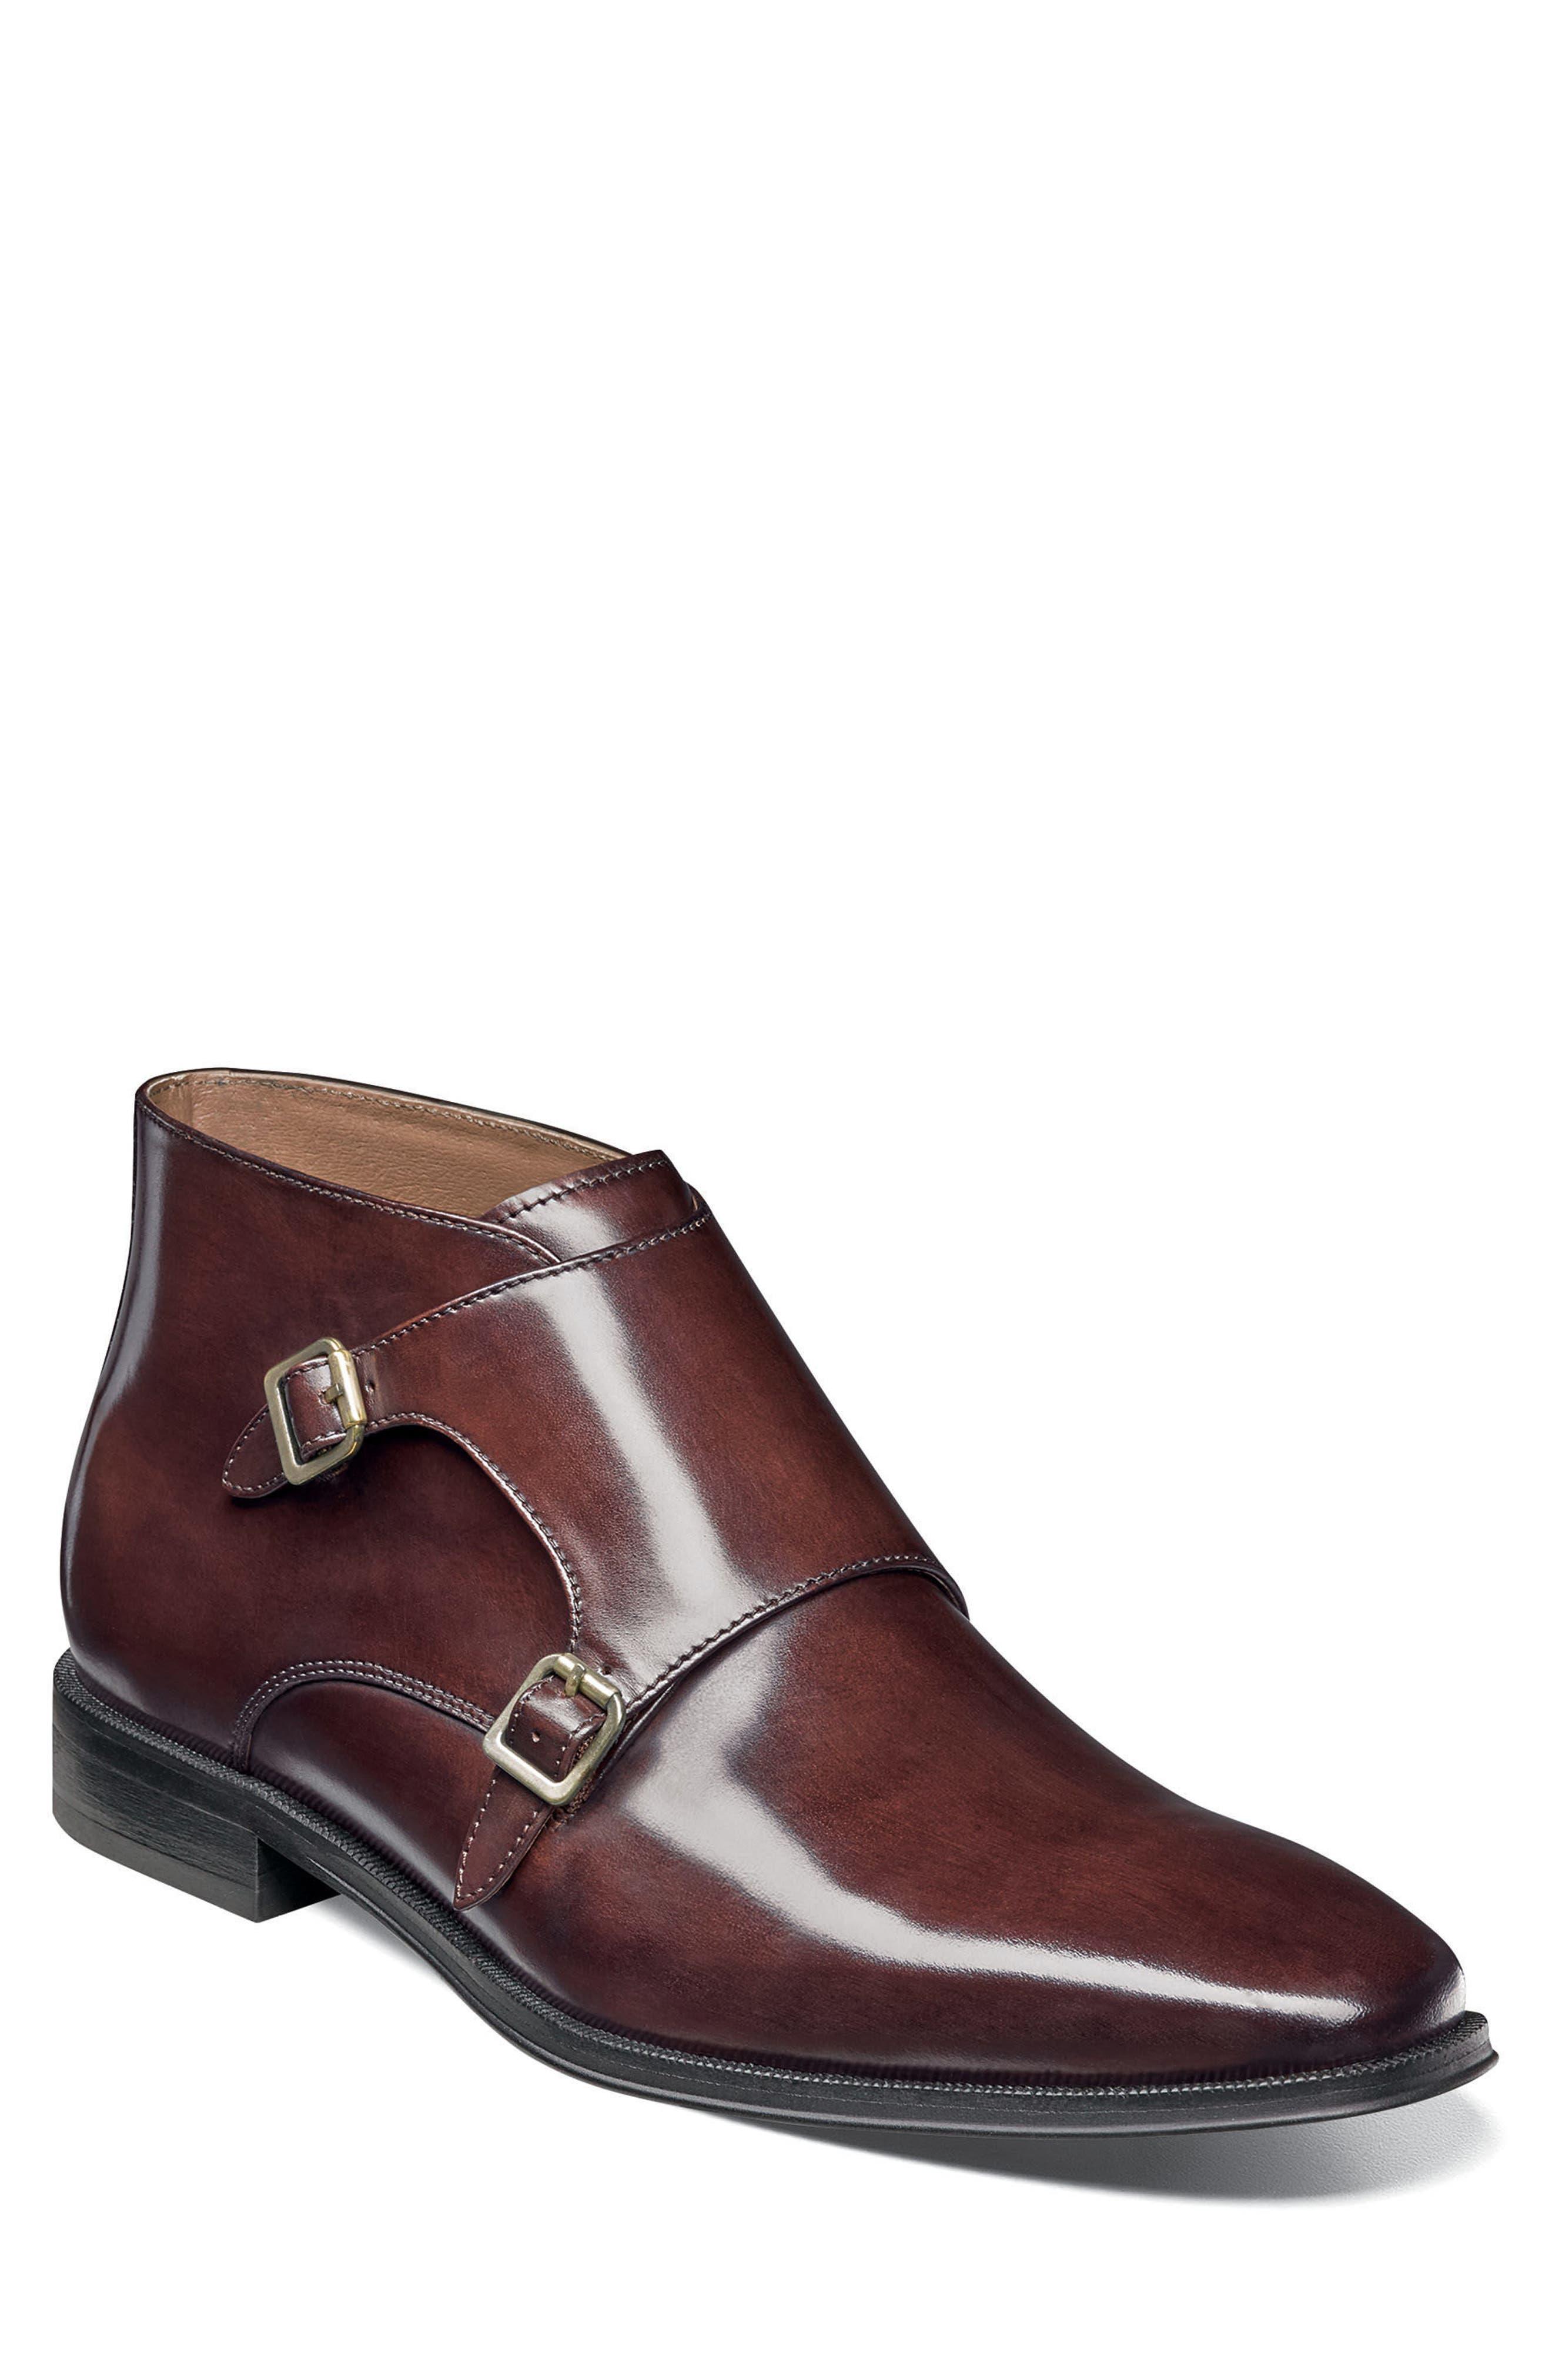 Alternate Image 1 Selected - Florsheim Belfast Double Monk Strap Boot (Men)